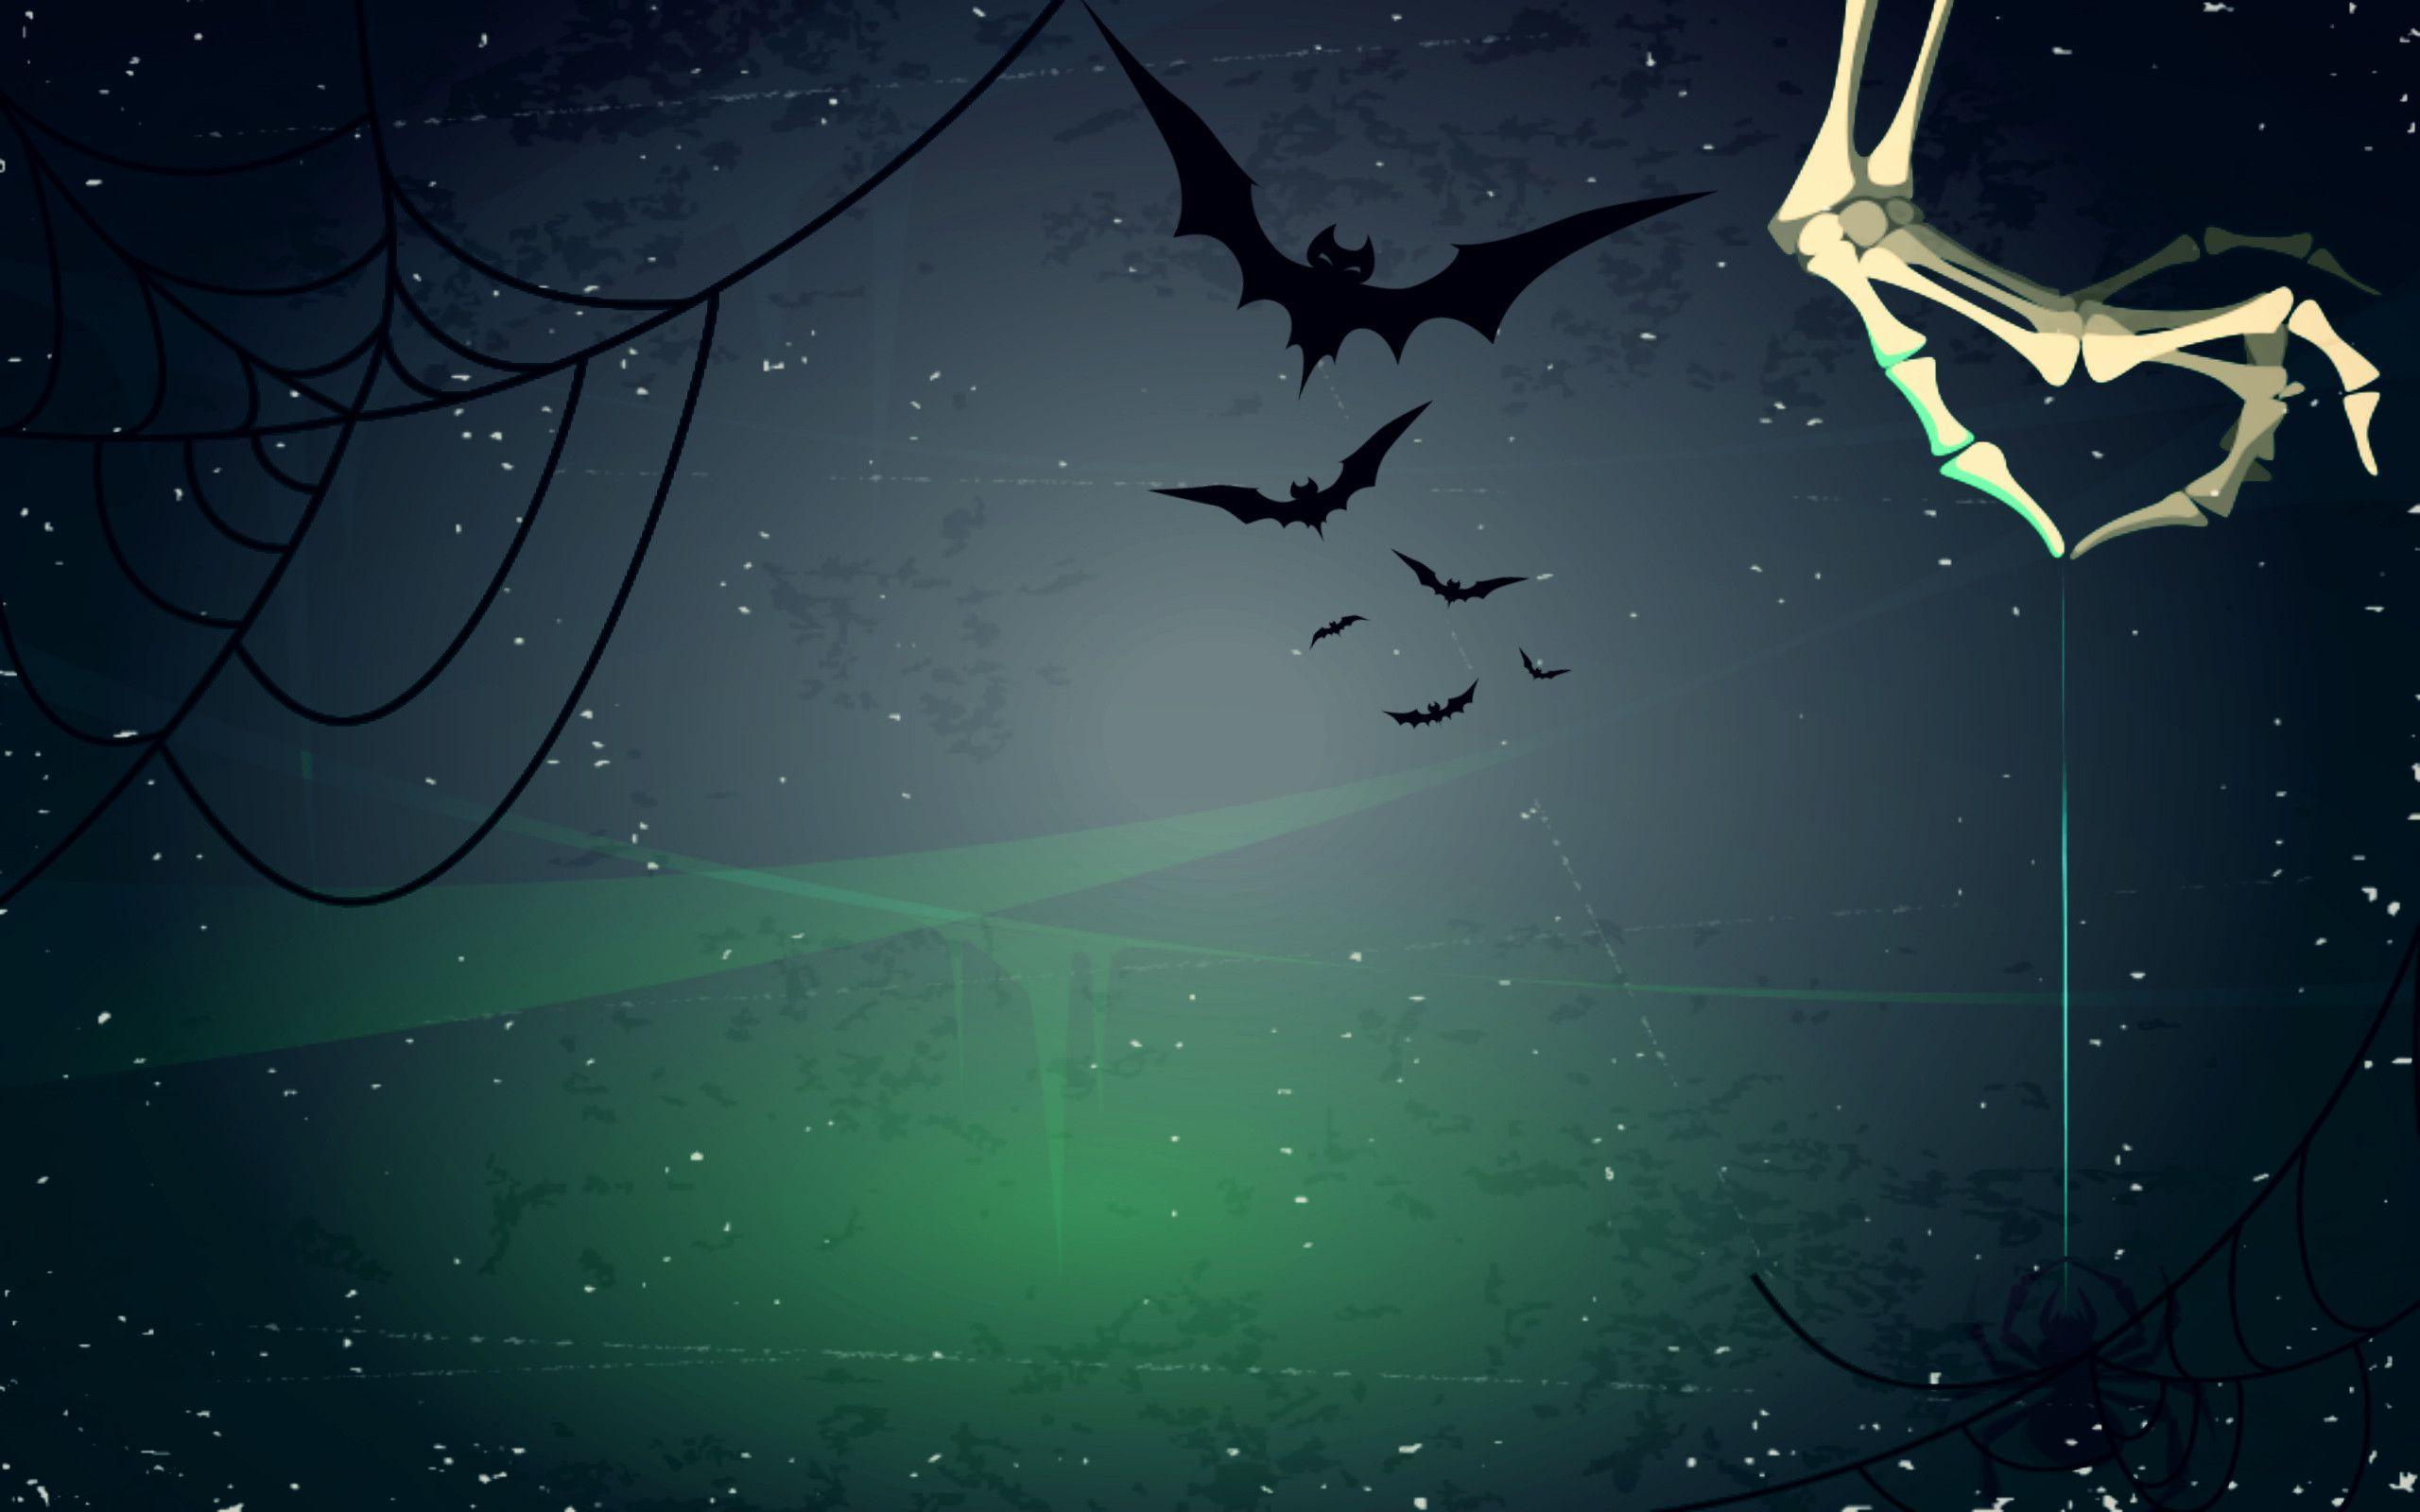 Halloween Backgrounds Image - Wallpaper Cave